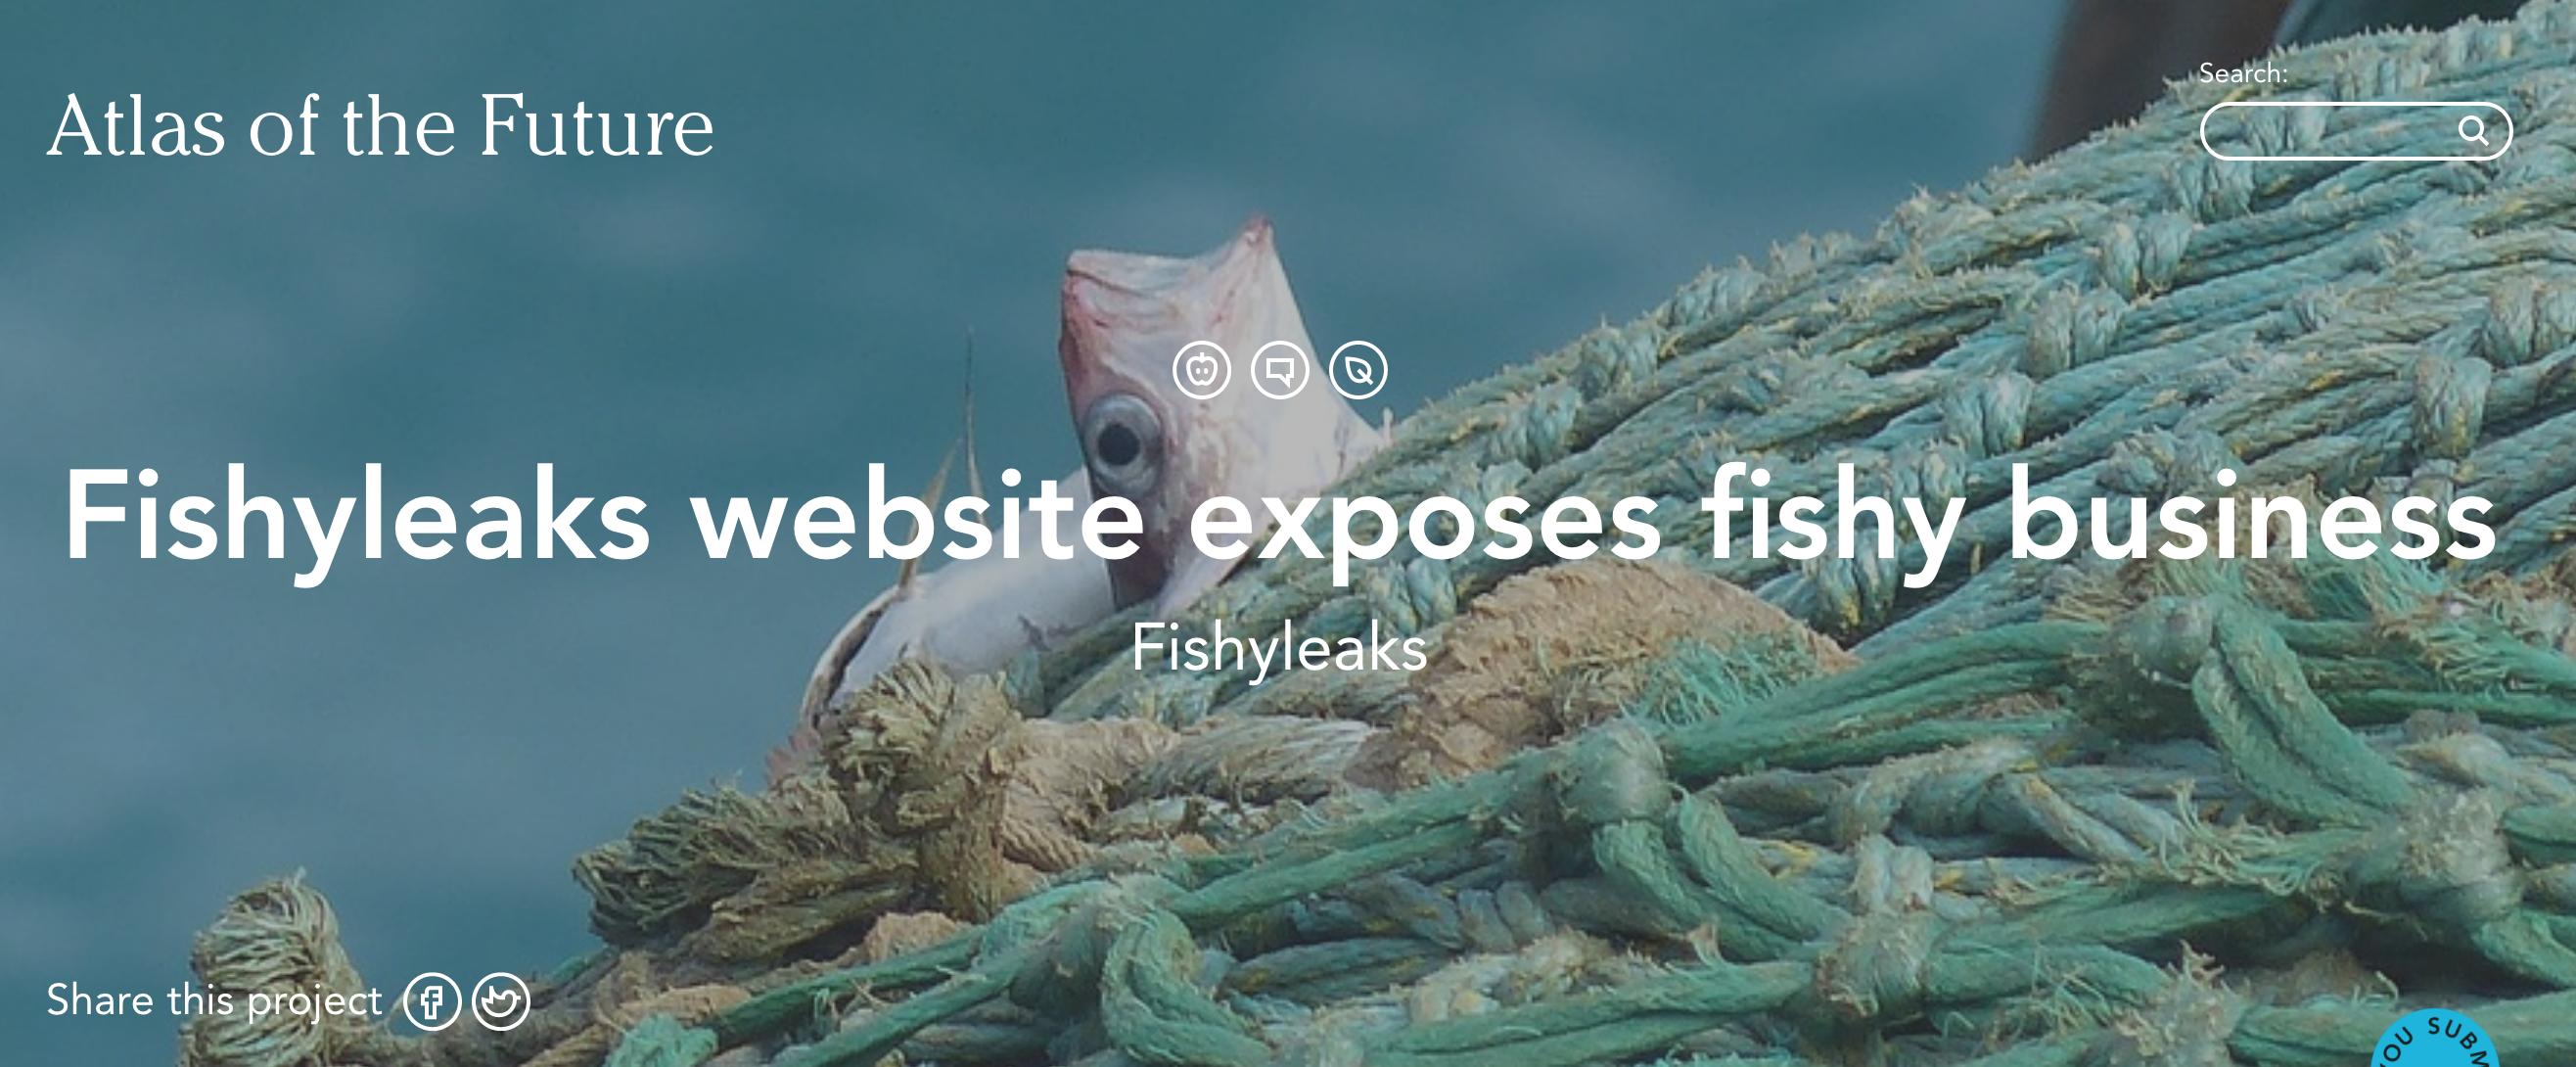 Media coverage archivos – Our Fish